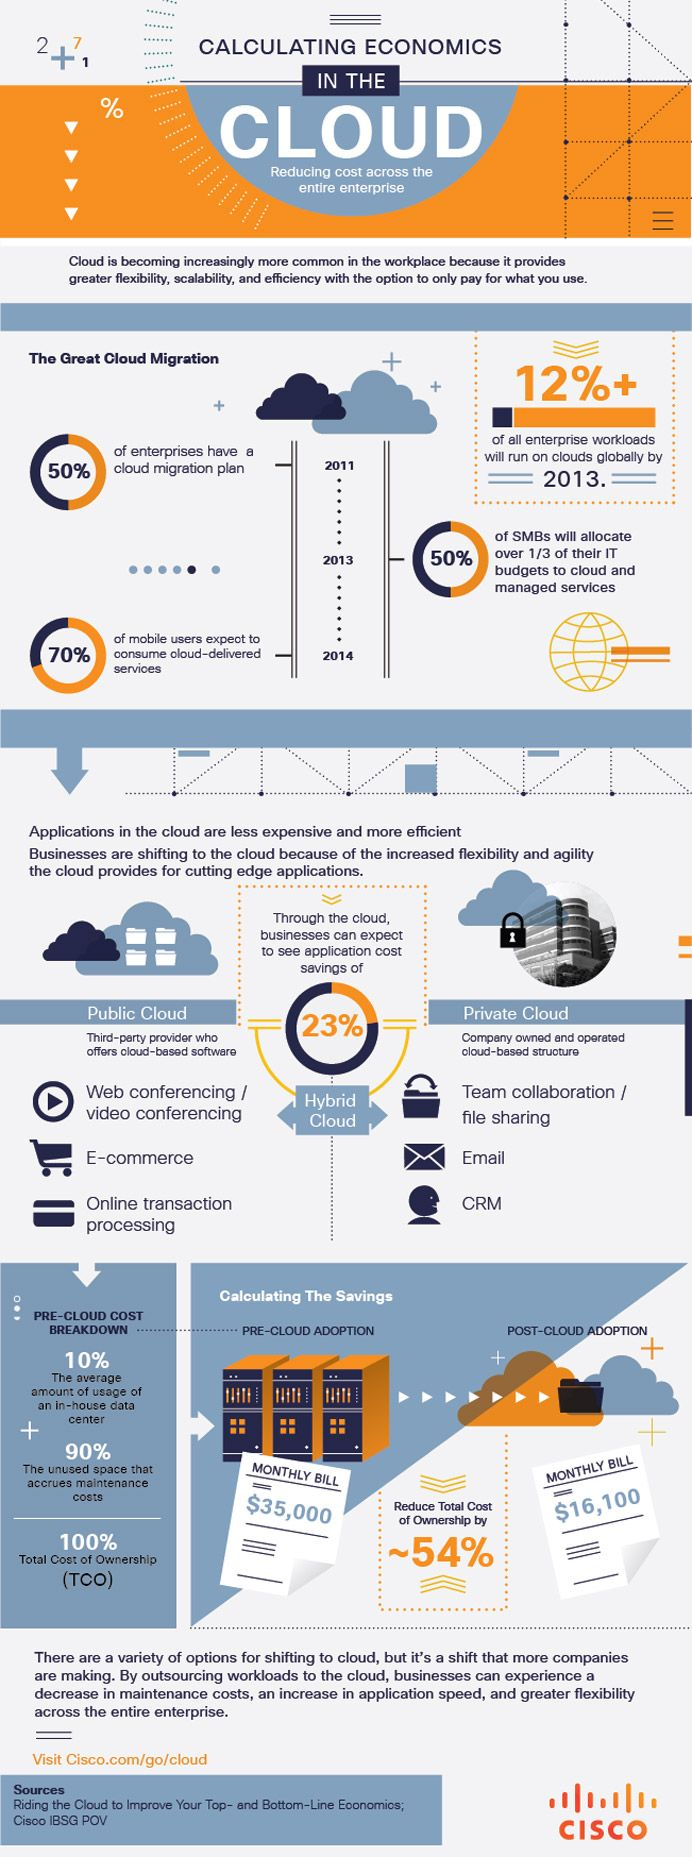 Cisco Visualization | Economics in the Cloud Infographic